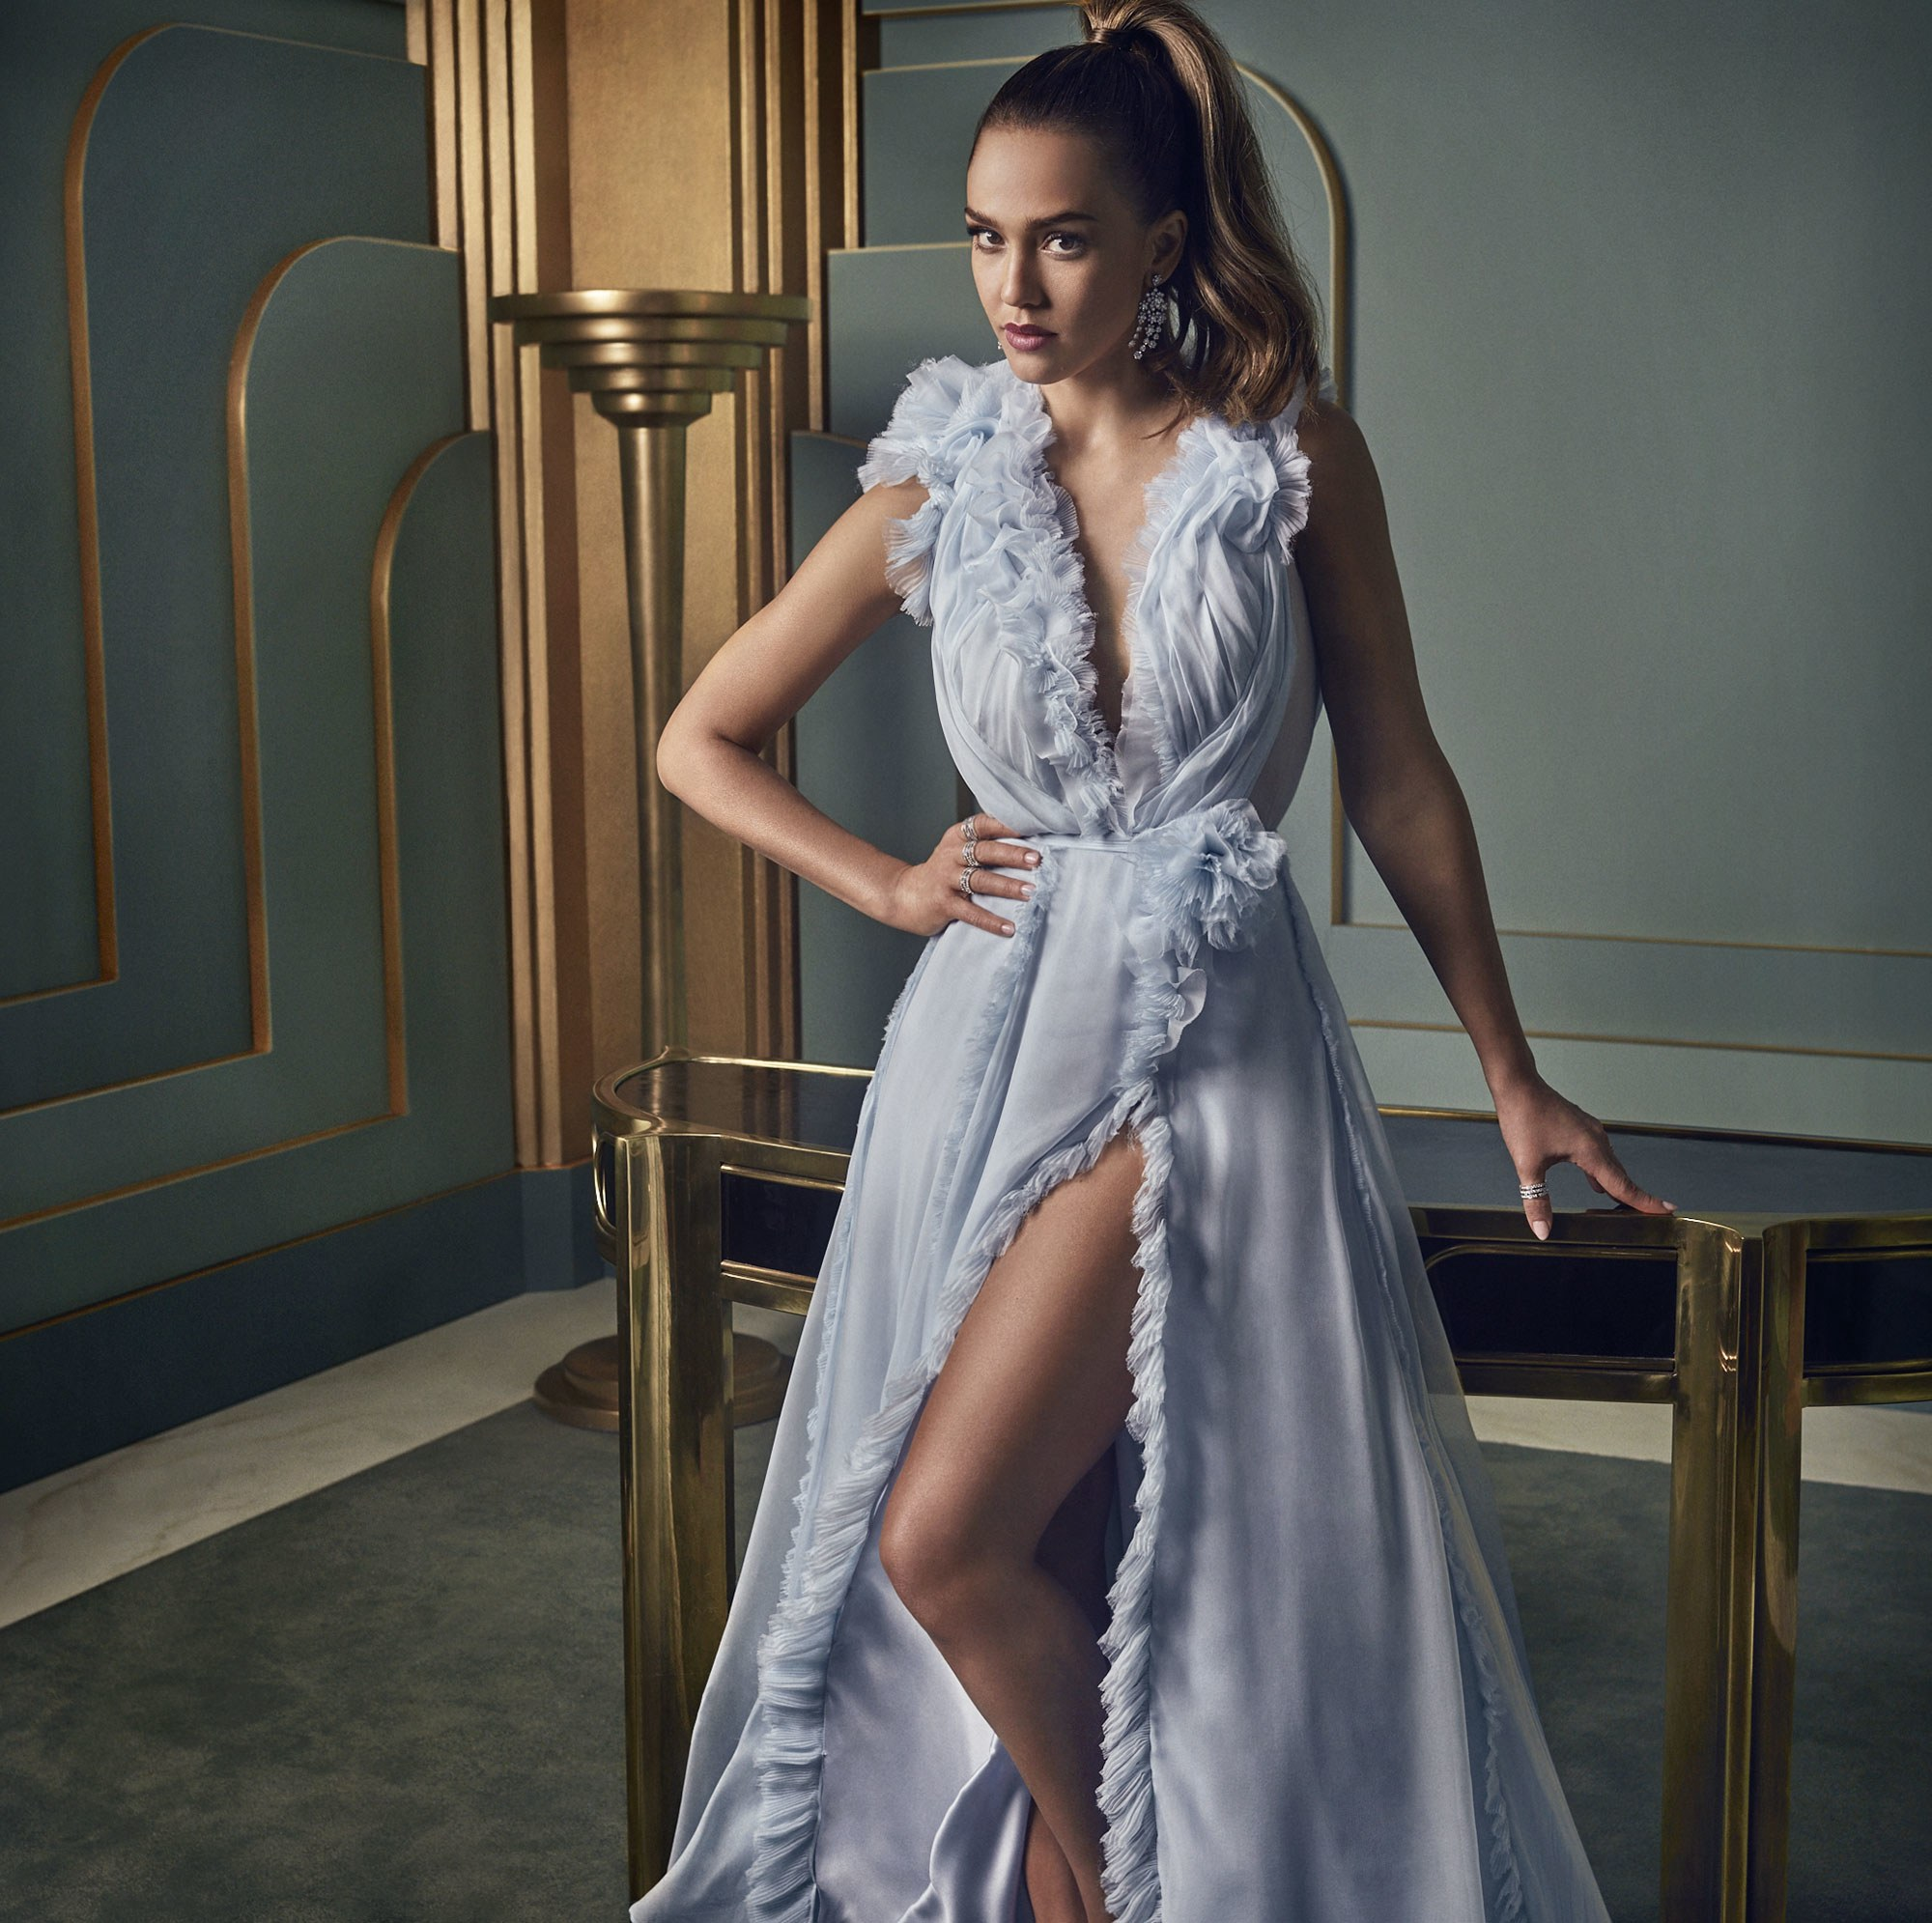 Jessica for Vanity Fair (2017)